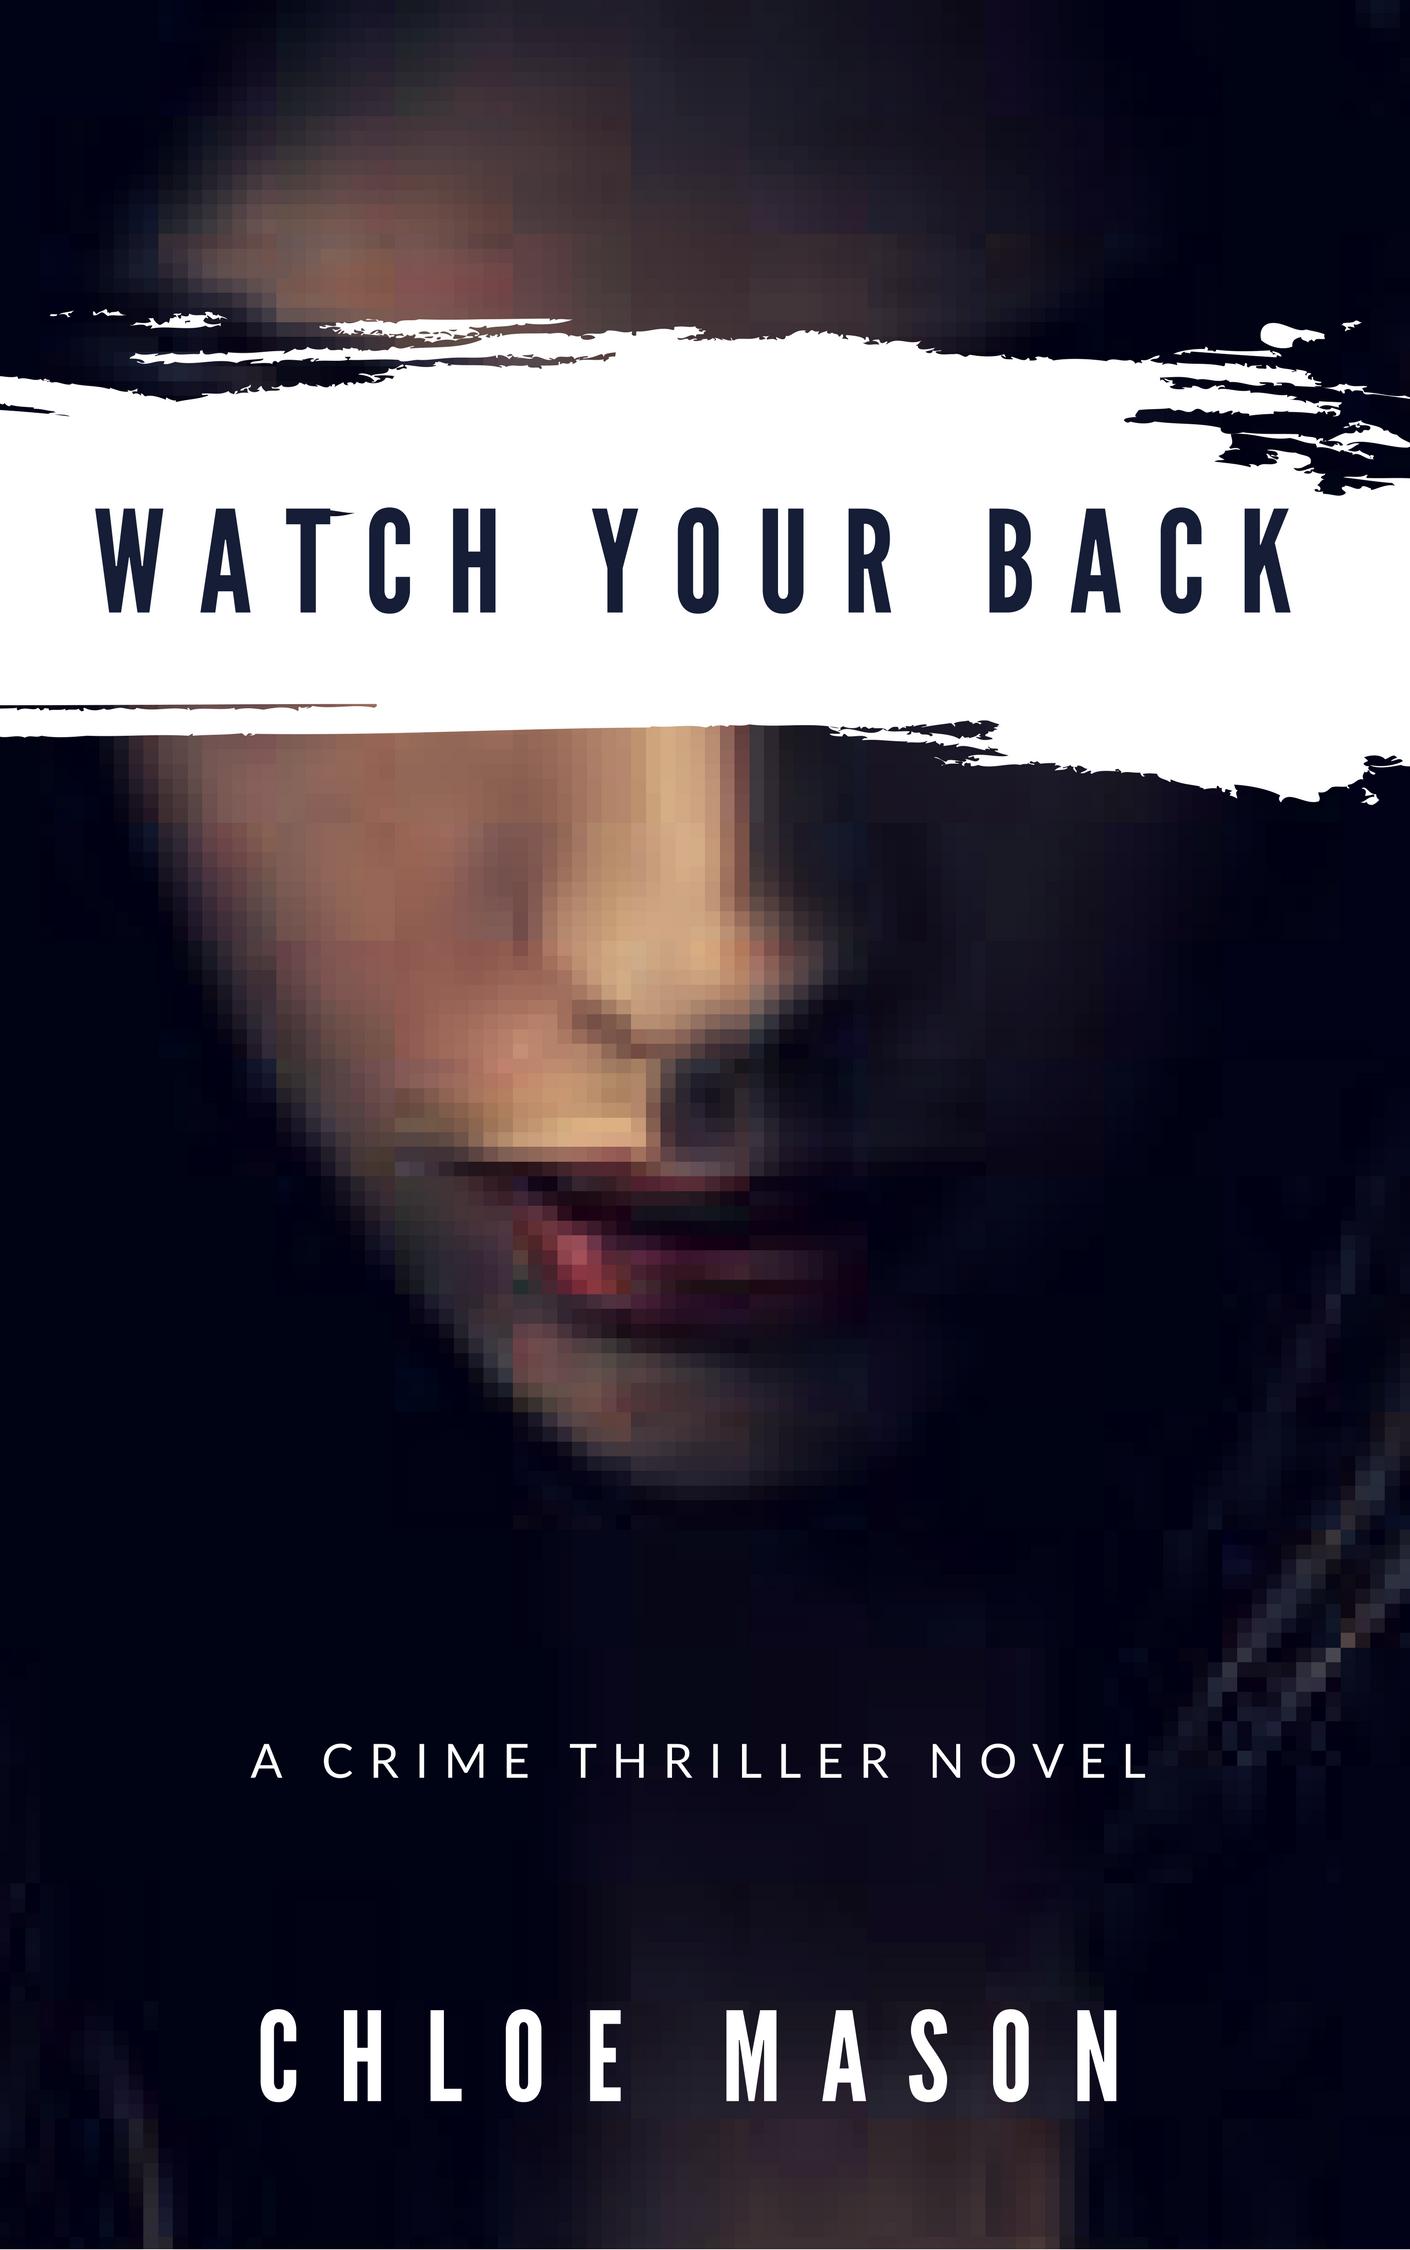 Watch Your Back By Chloe Mason